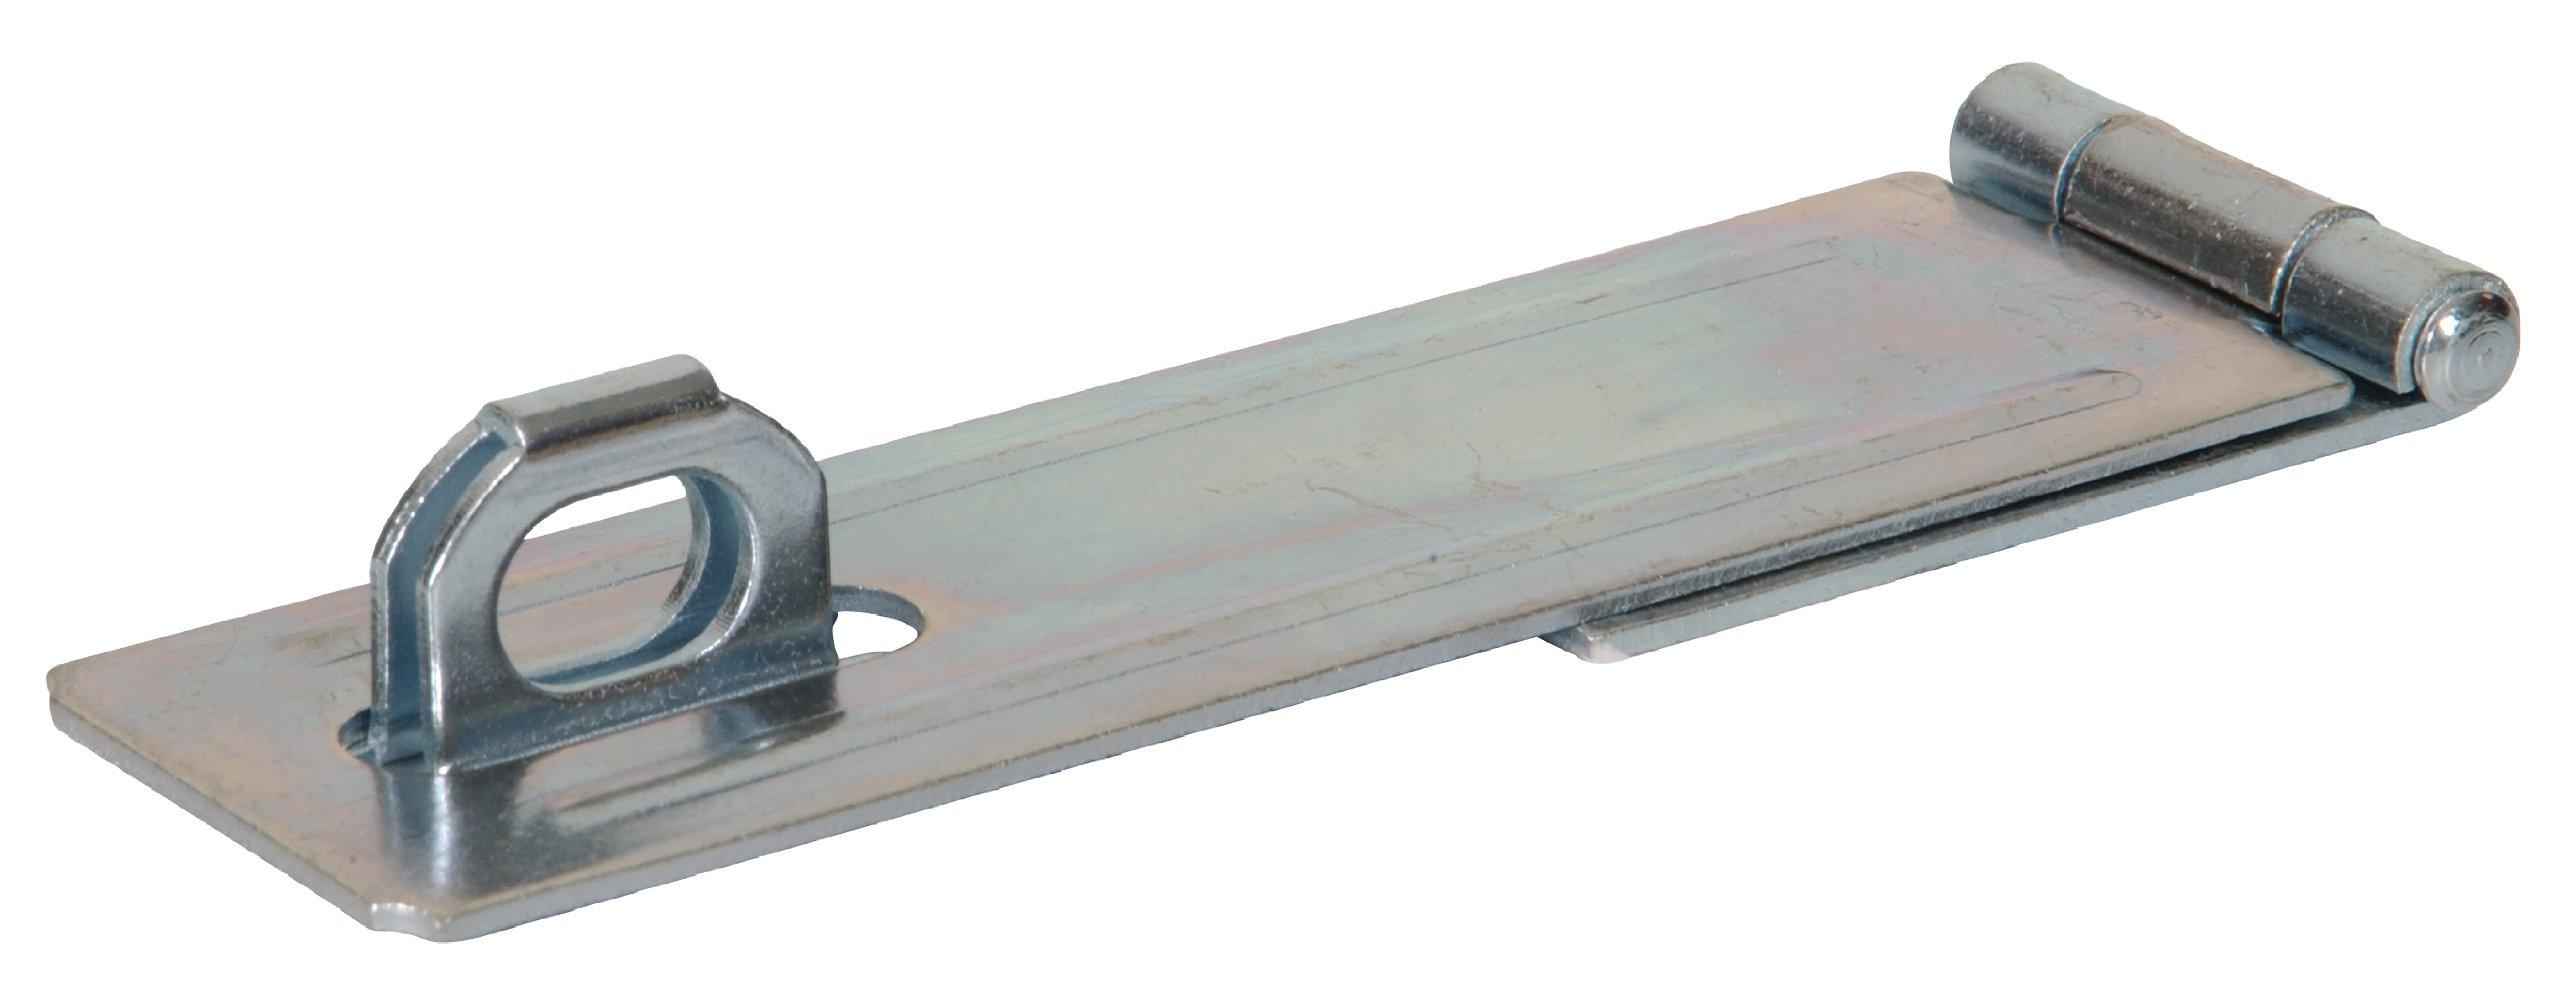 Hillman Hardware Essentials Fixed Staple Safety Hasps 7'', Zinc Finish, 10-Pack